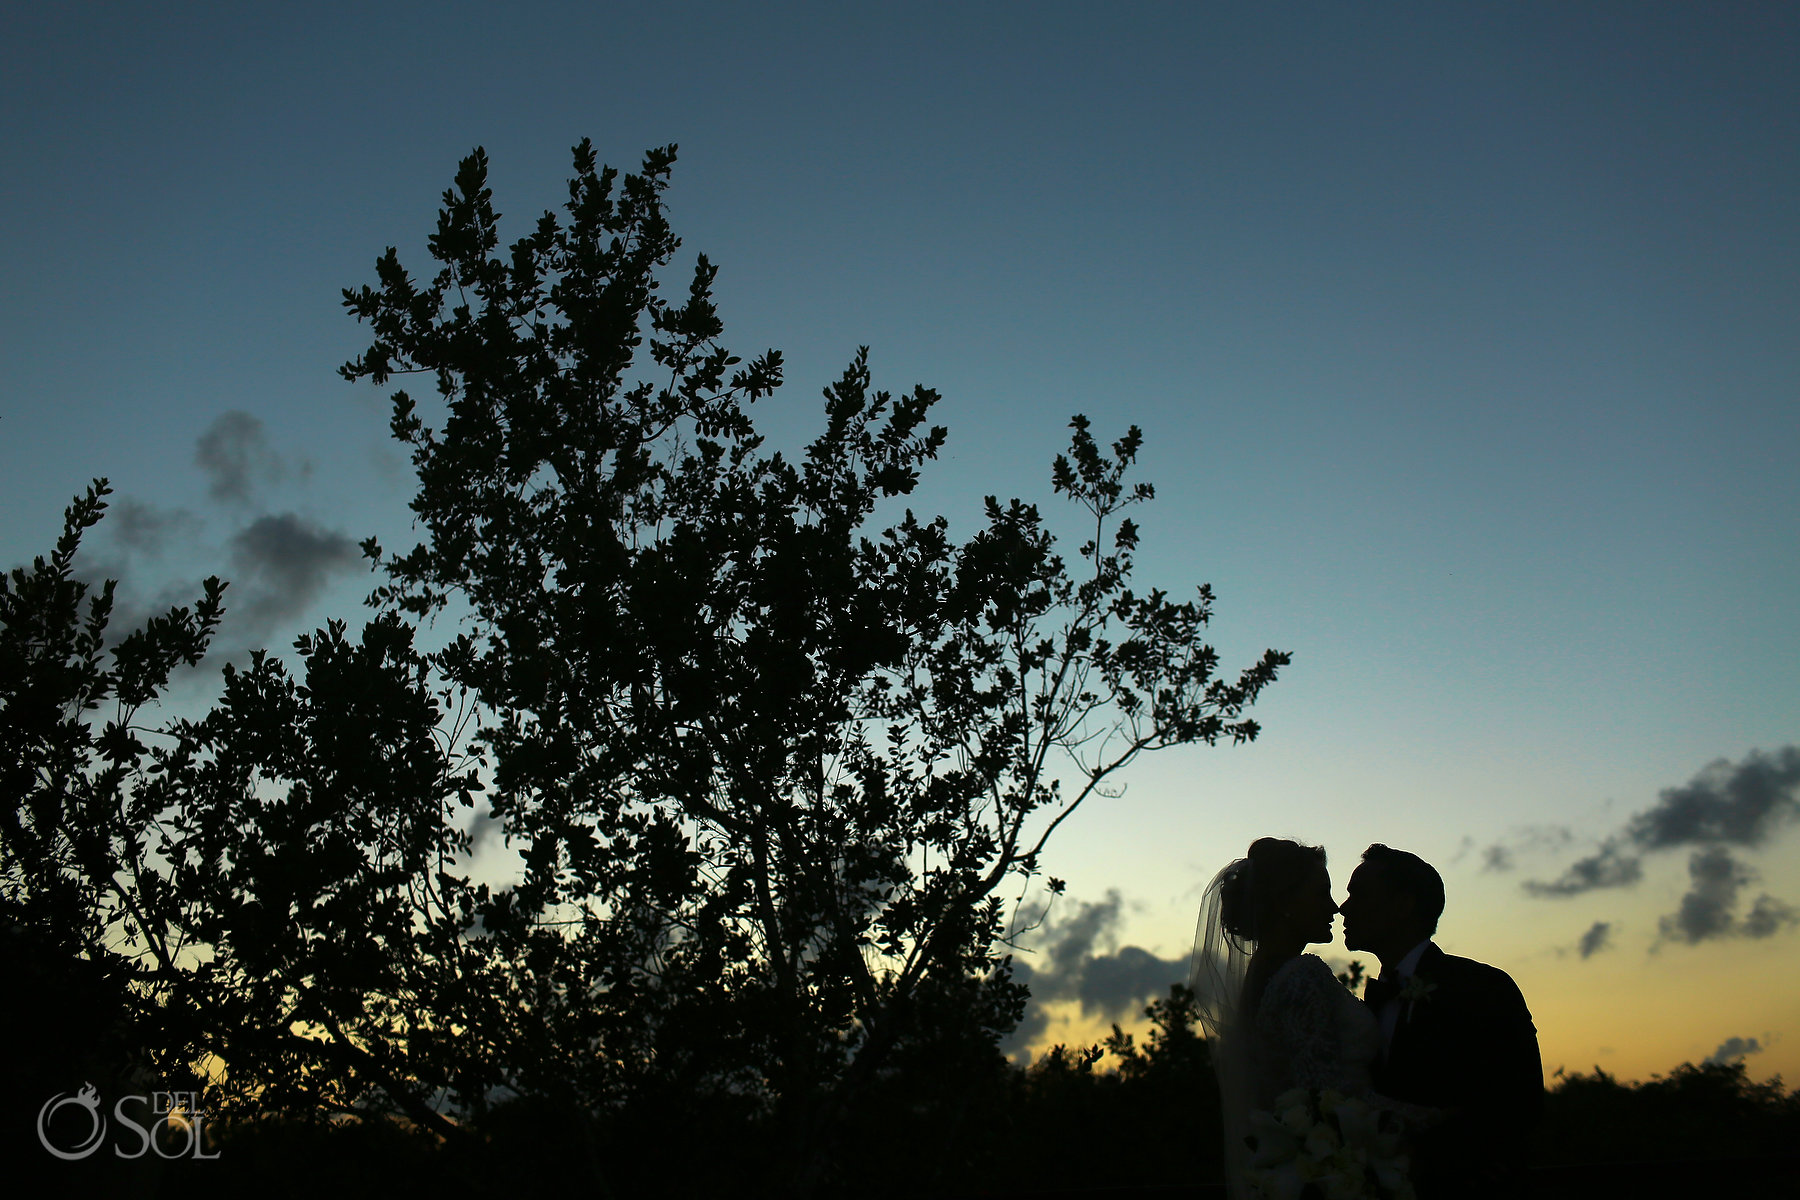 sunset silhouette destination wedding bride and groom portrait blue diamond luxury boutique hotel